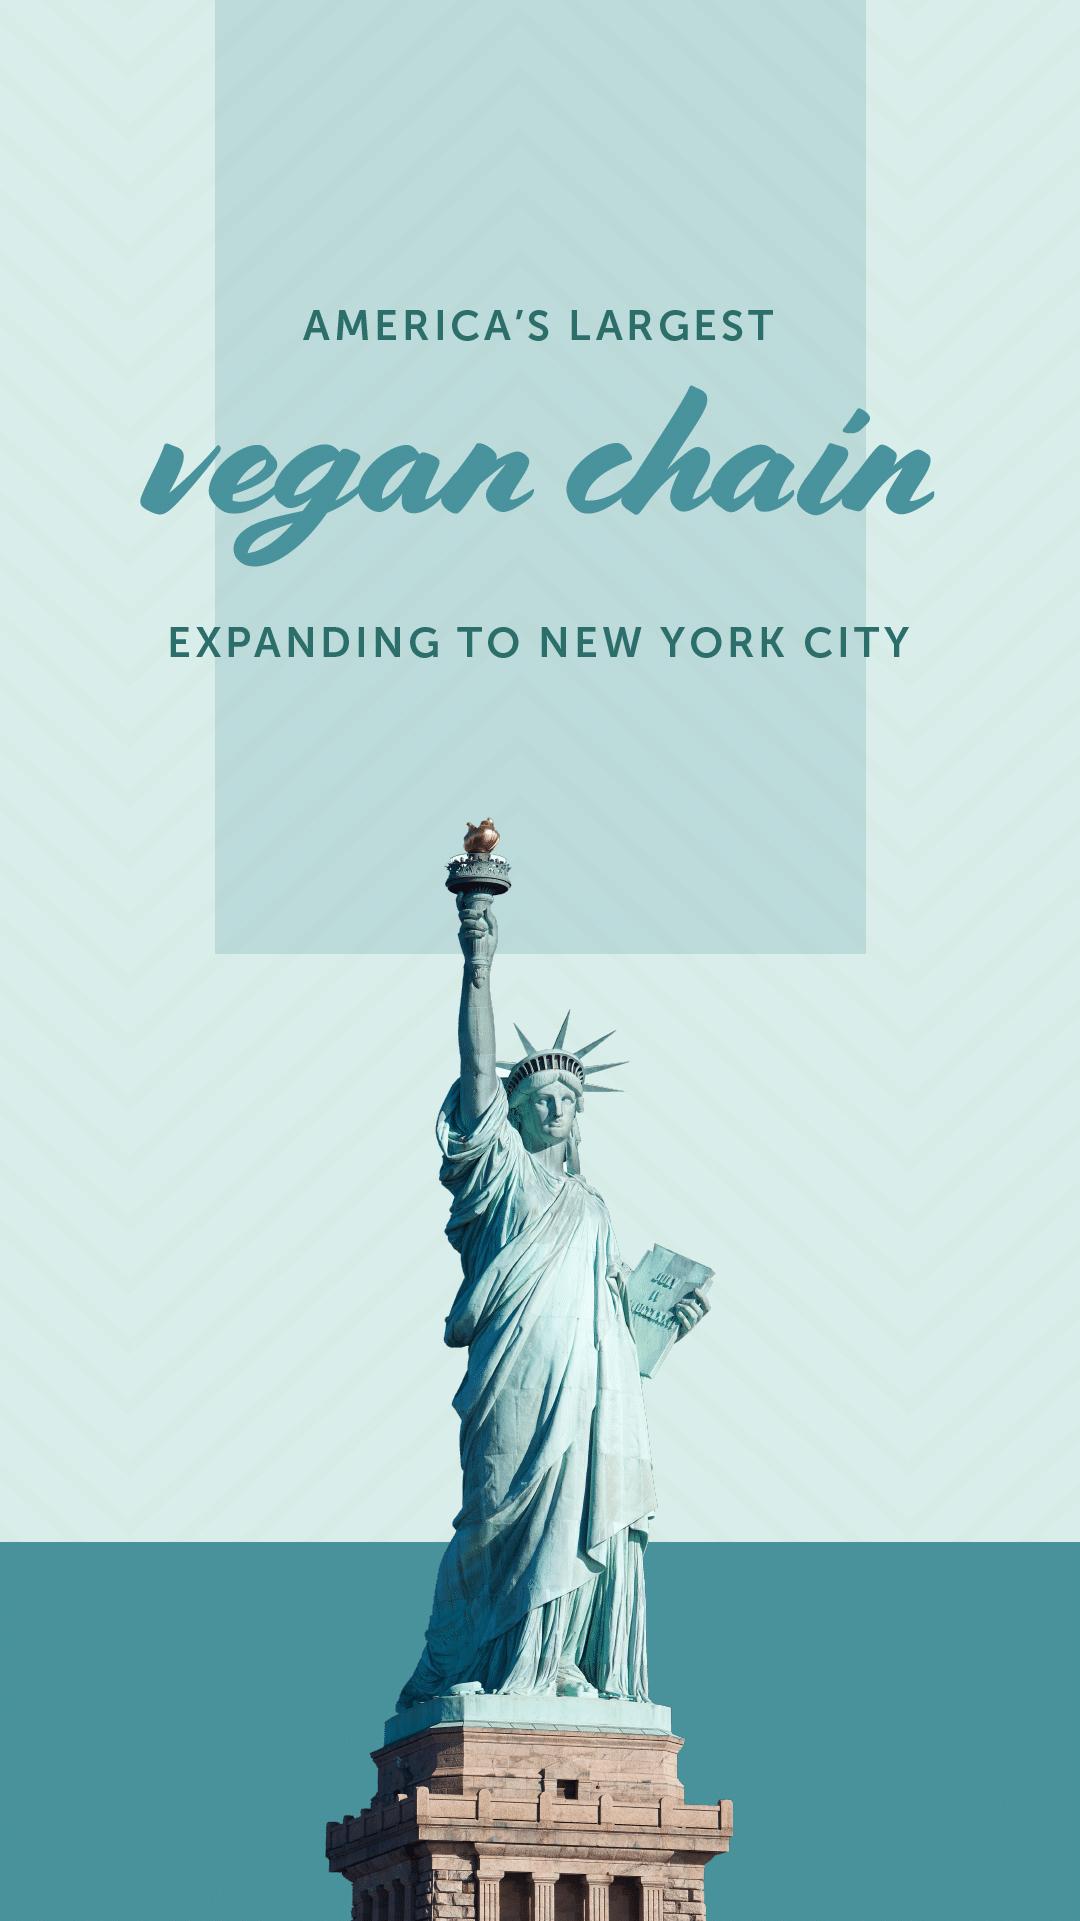 America's Largest Vegan Chain Expanding to New York City